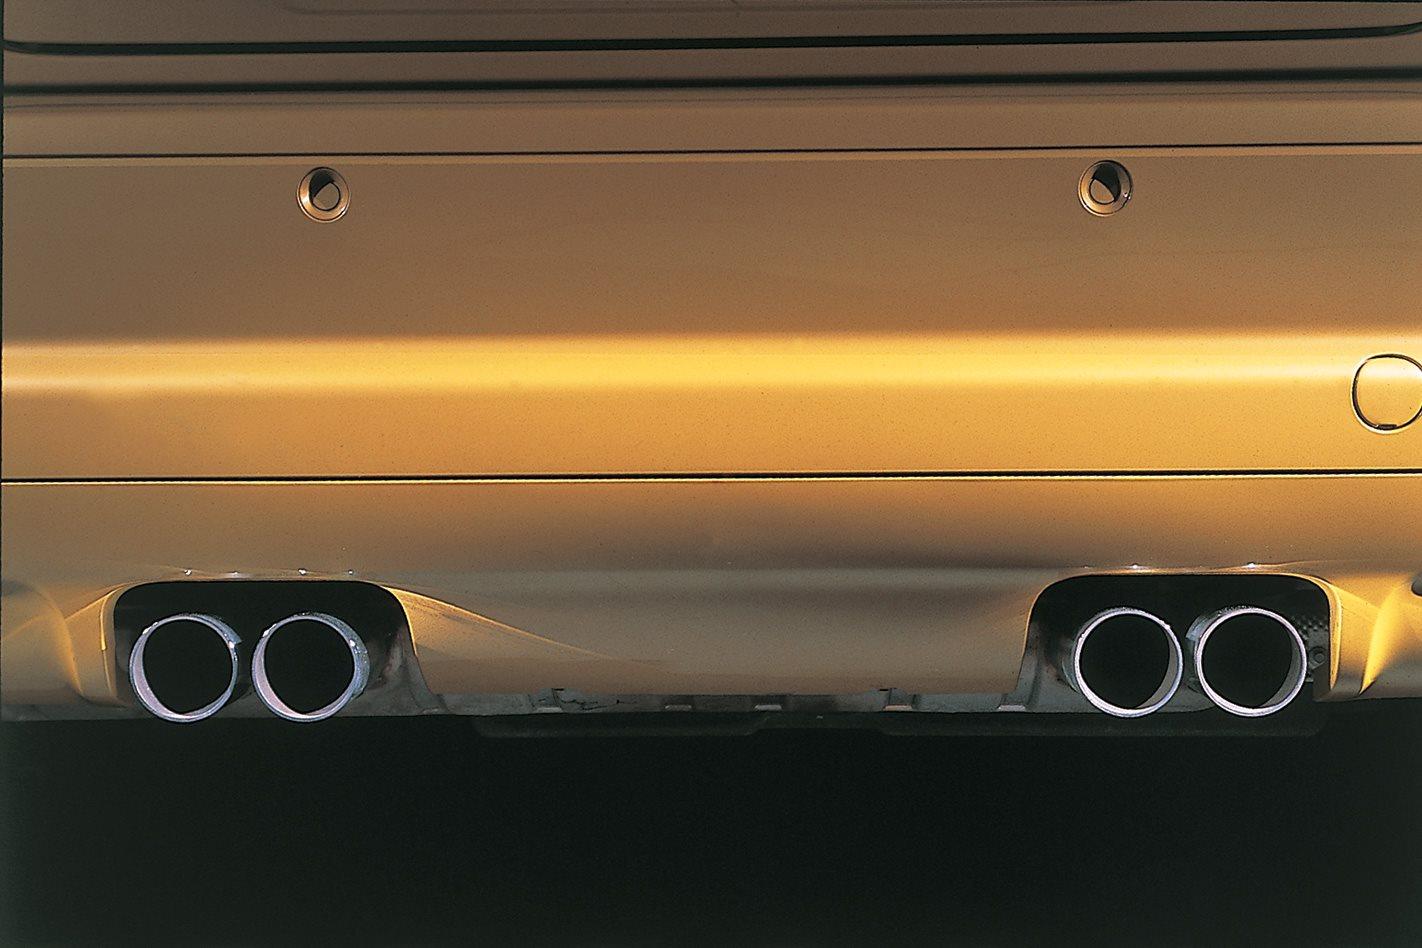 2002-BMW-E46-M3-EXHAUST.jpg